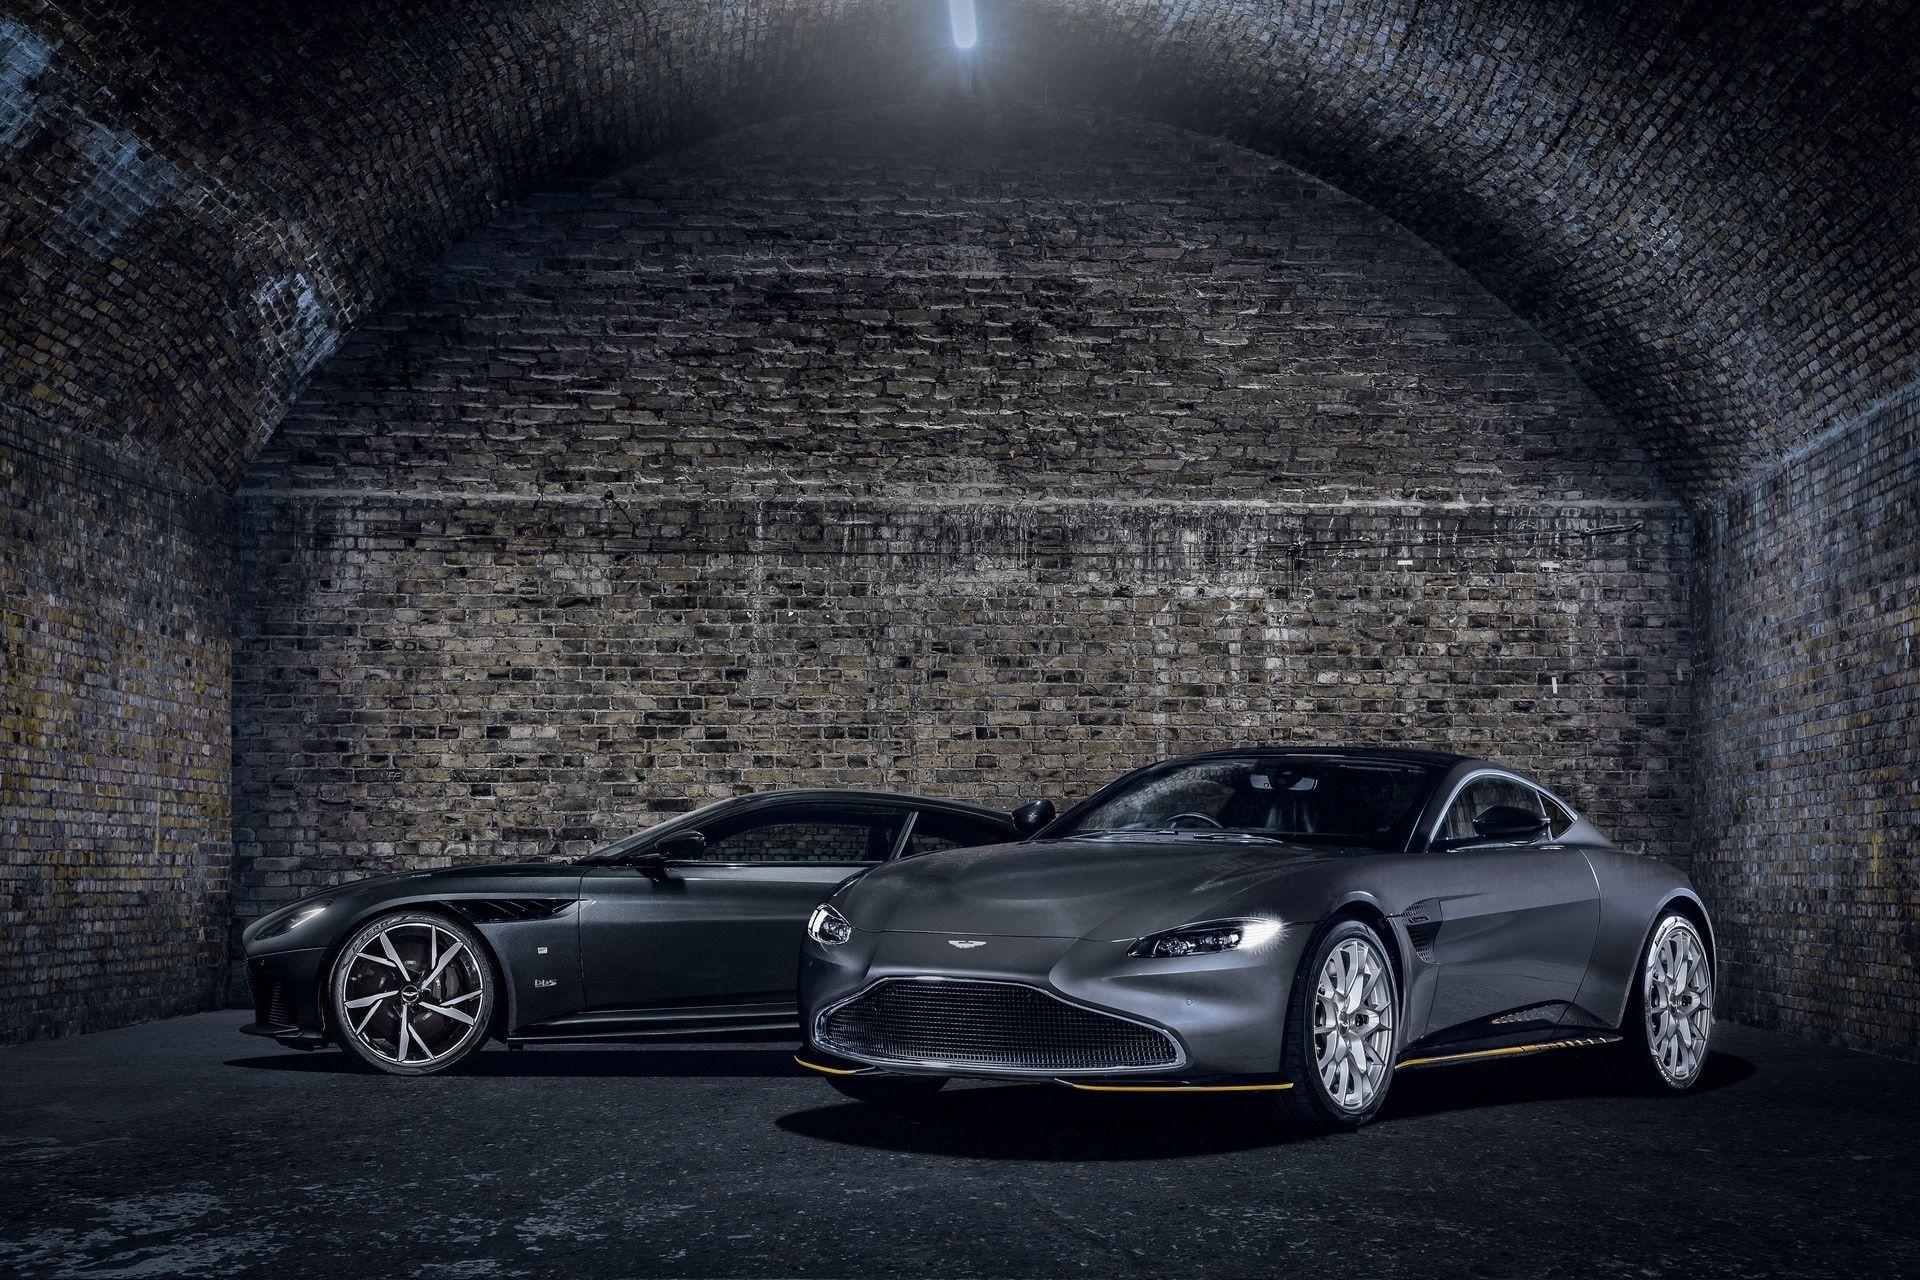 2021-aston-martin-vantage-dbs-superleggera-007-edition-2